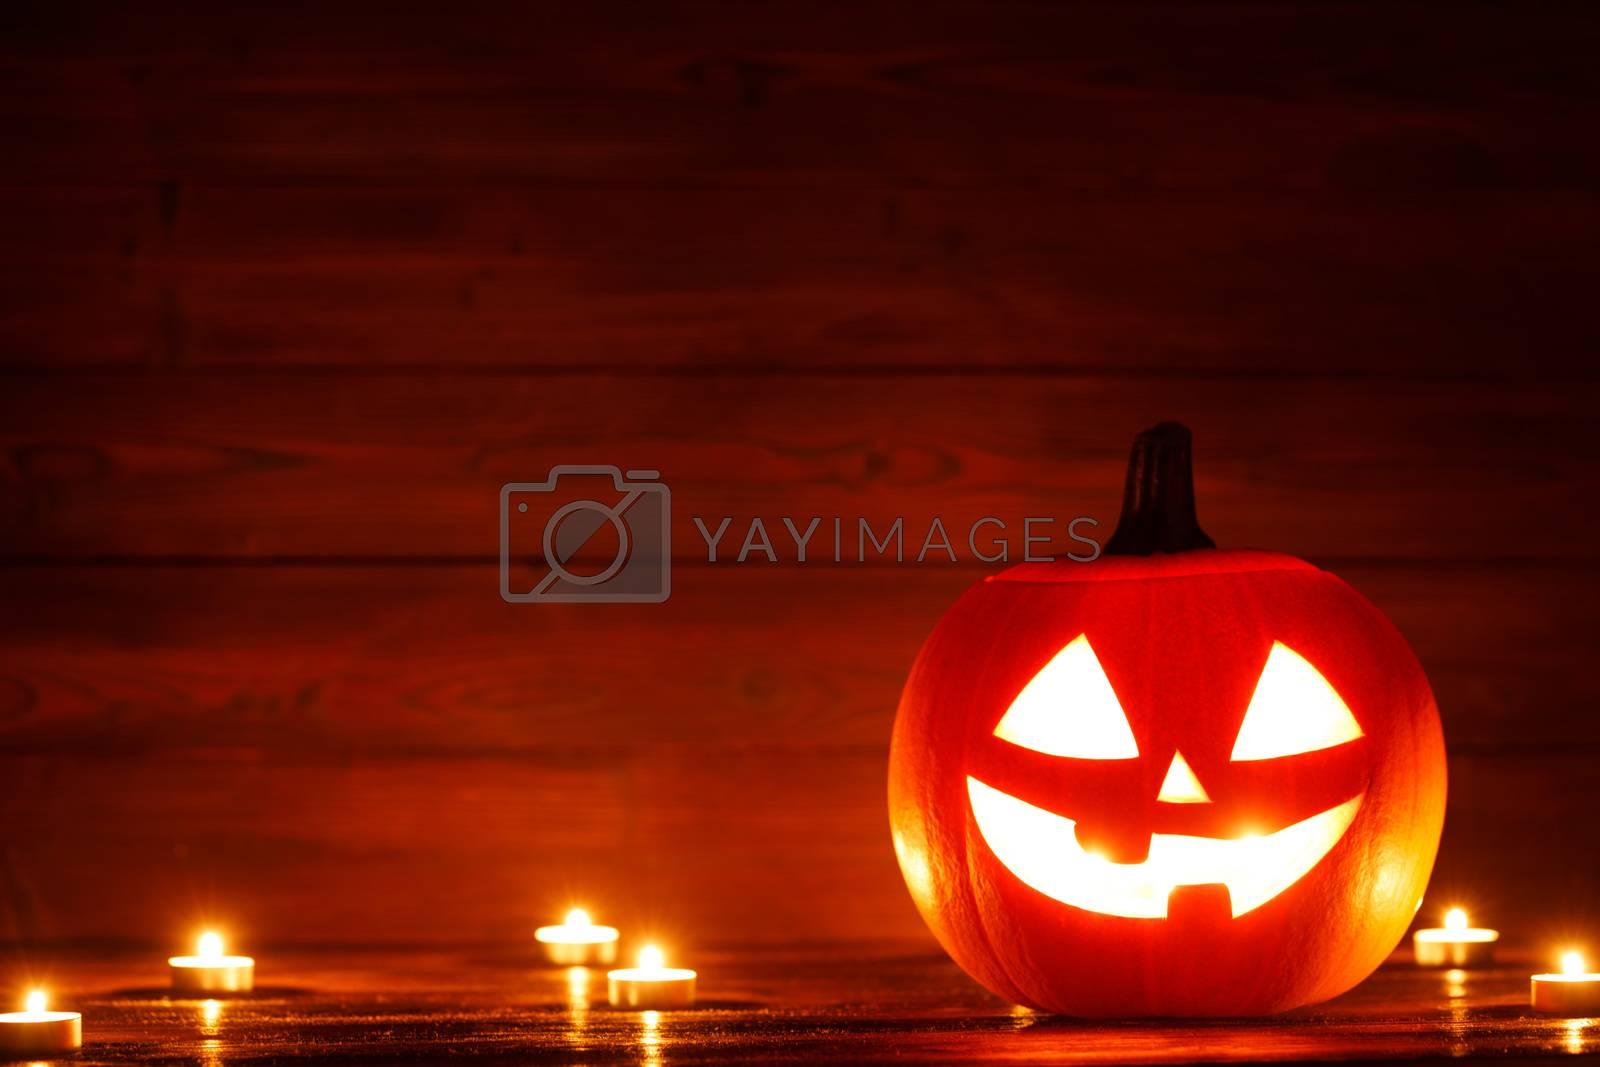 Halloween lantern pumpkin and candles by Yellowj